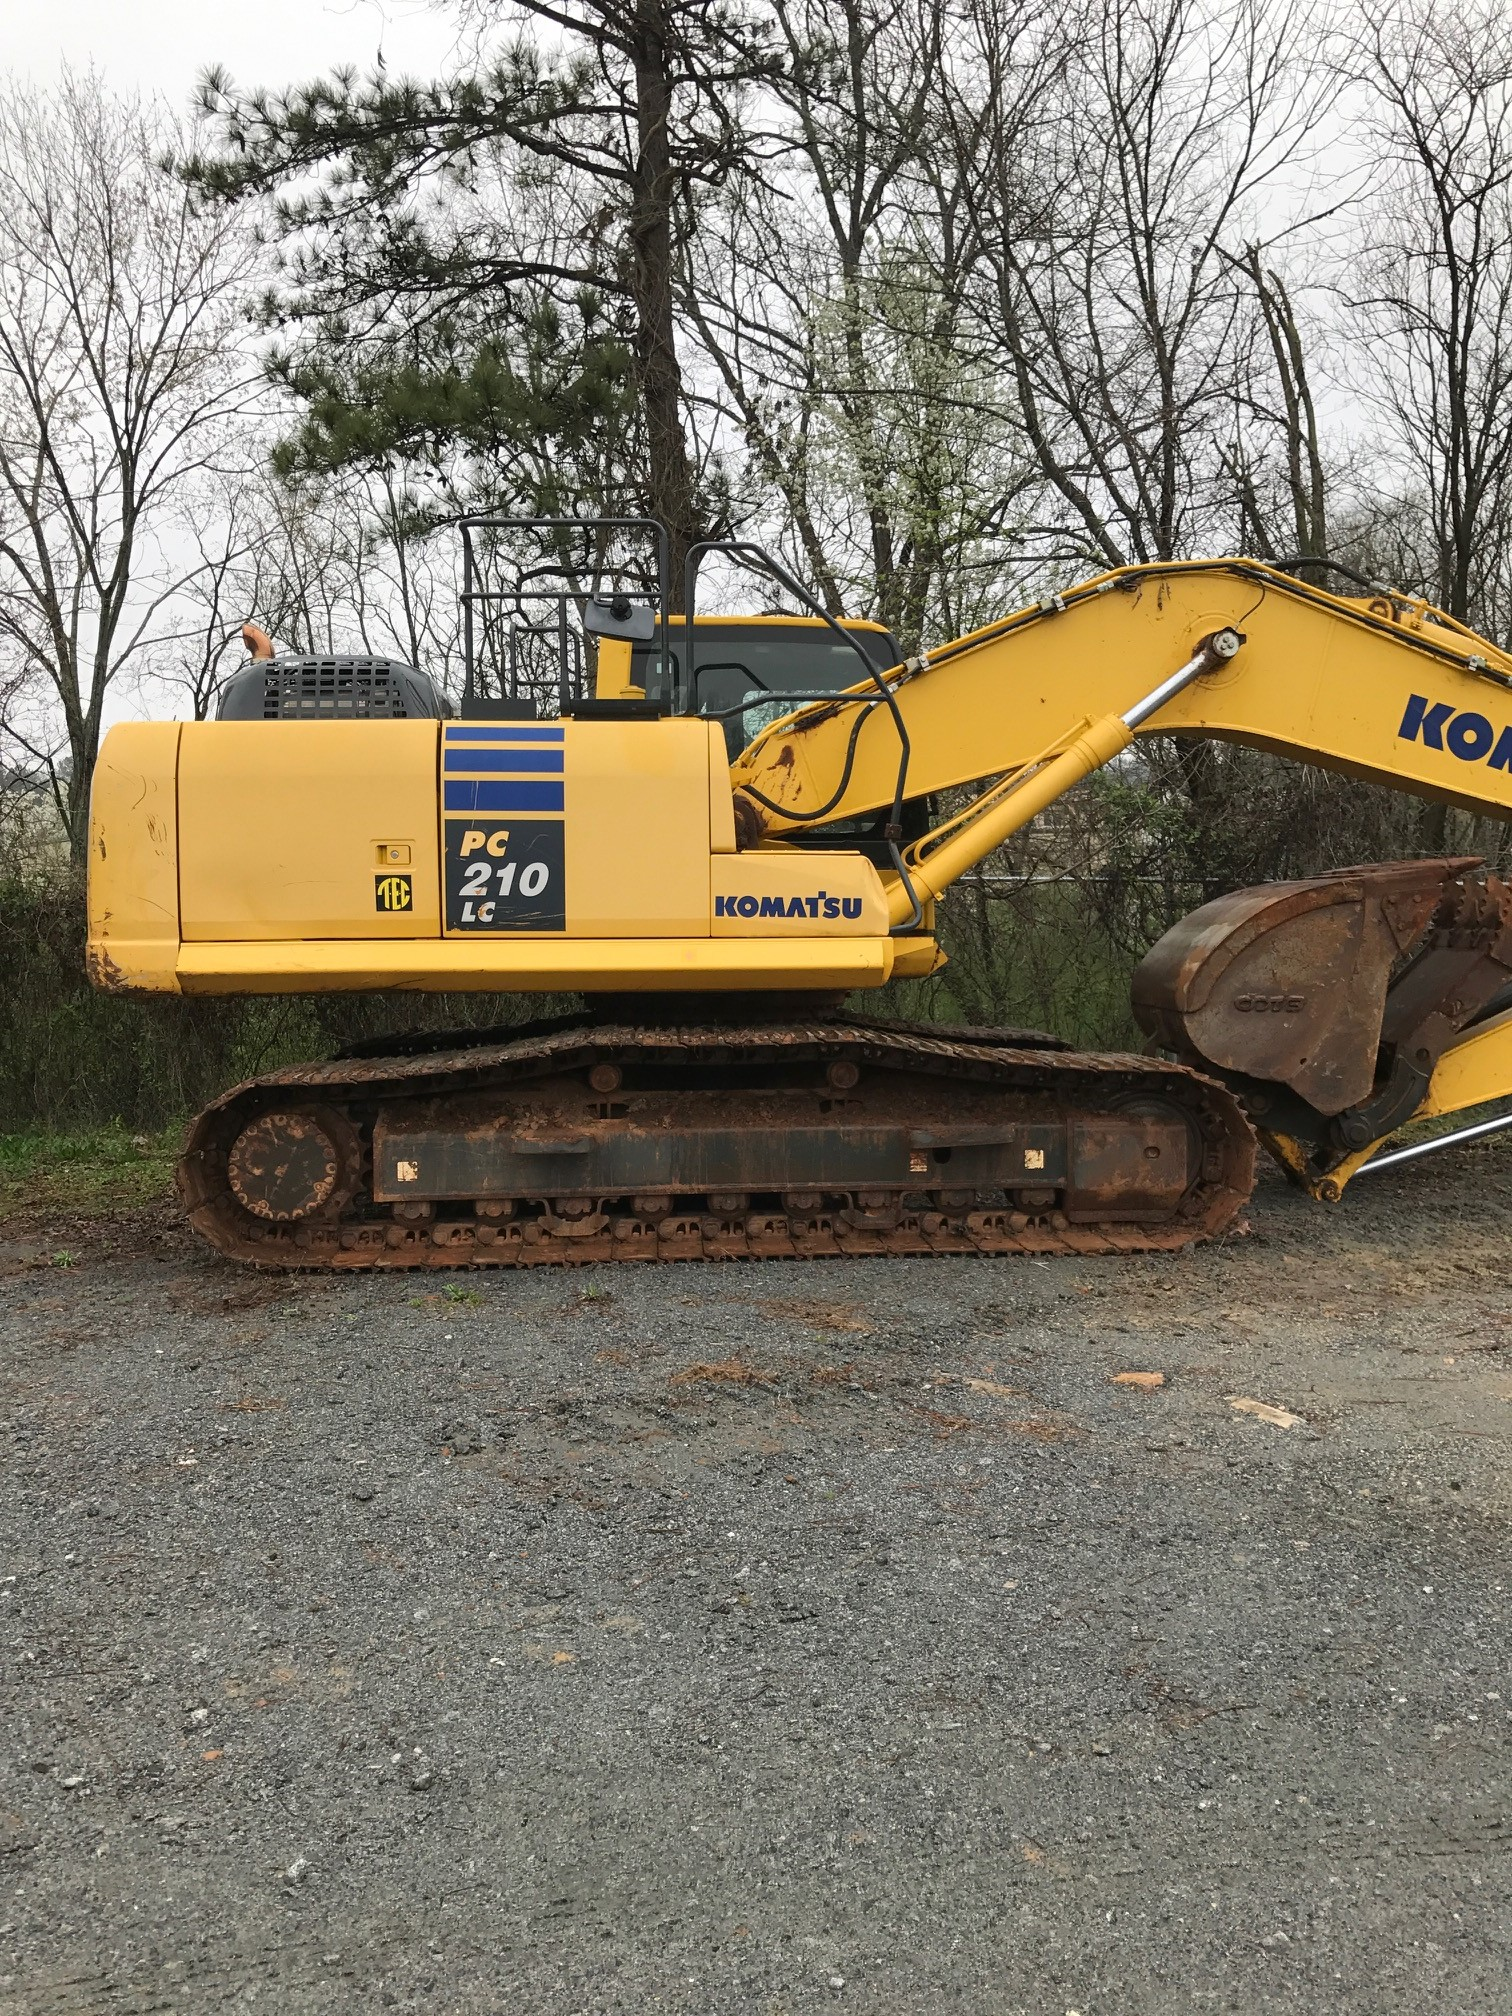 Used, 2014, Komatsu, PC210LC-10, Excavators